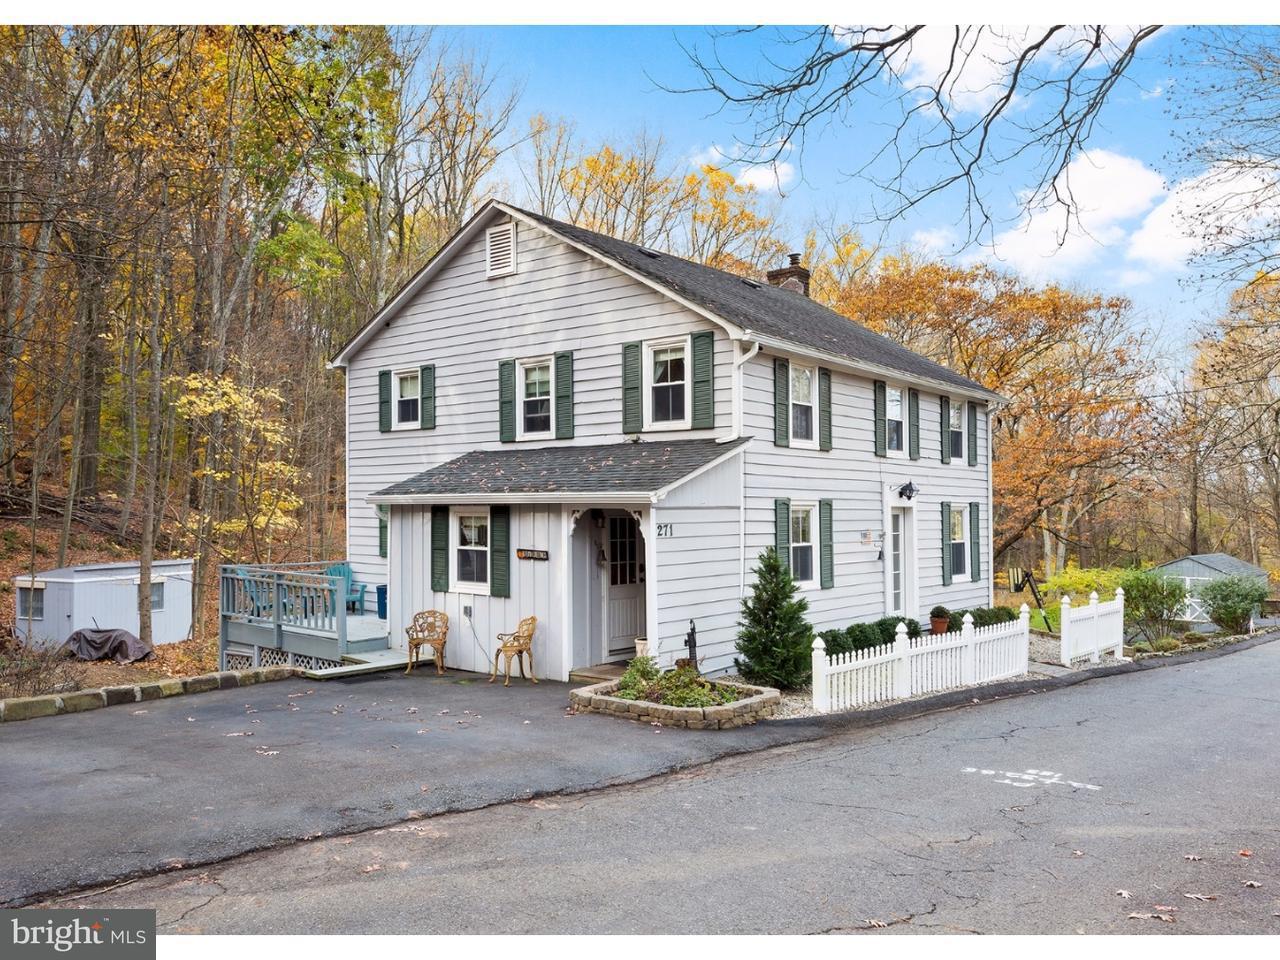 独户住宅 为 销售 在 271 STANTON MOUNTAIN Road Clinton Township, 新泽西州 08833 美国